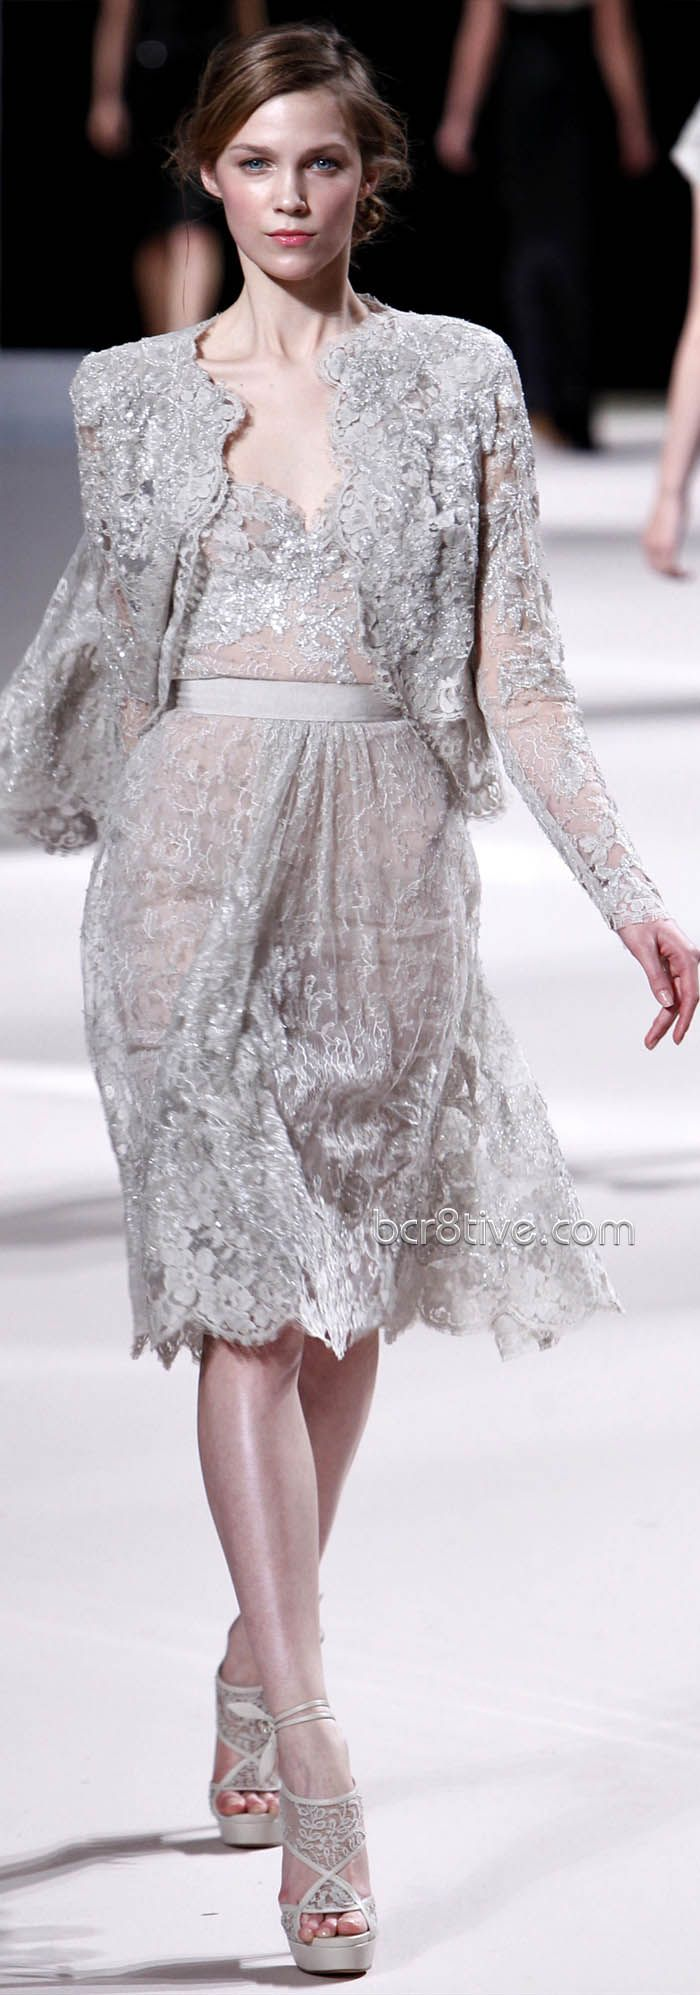 Elie Saab Spring Summer 2011 Haute Couture   Elie saab spring ...